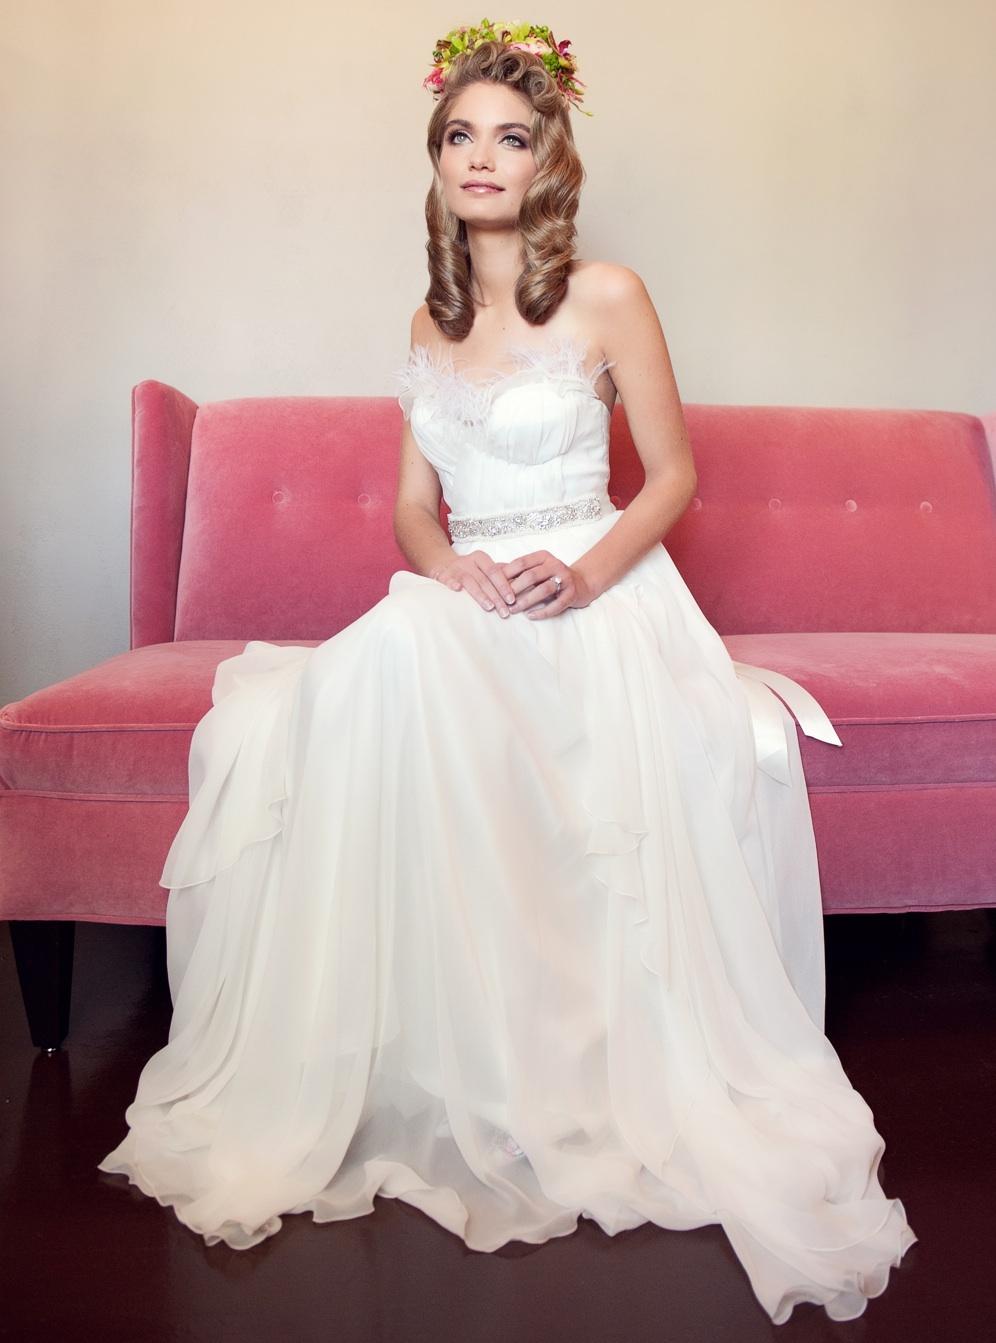 Princess-bride-wedding-dress-handmade-bridal-gown.full